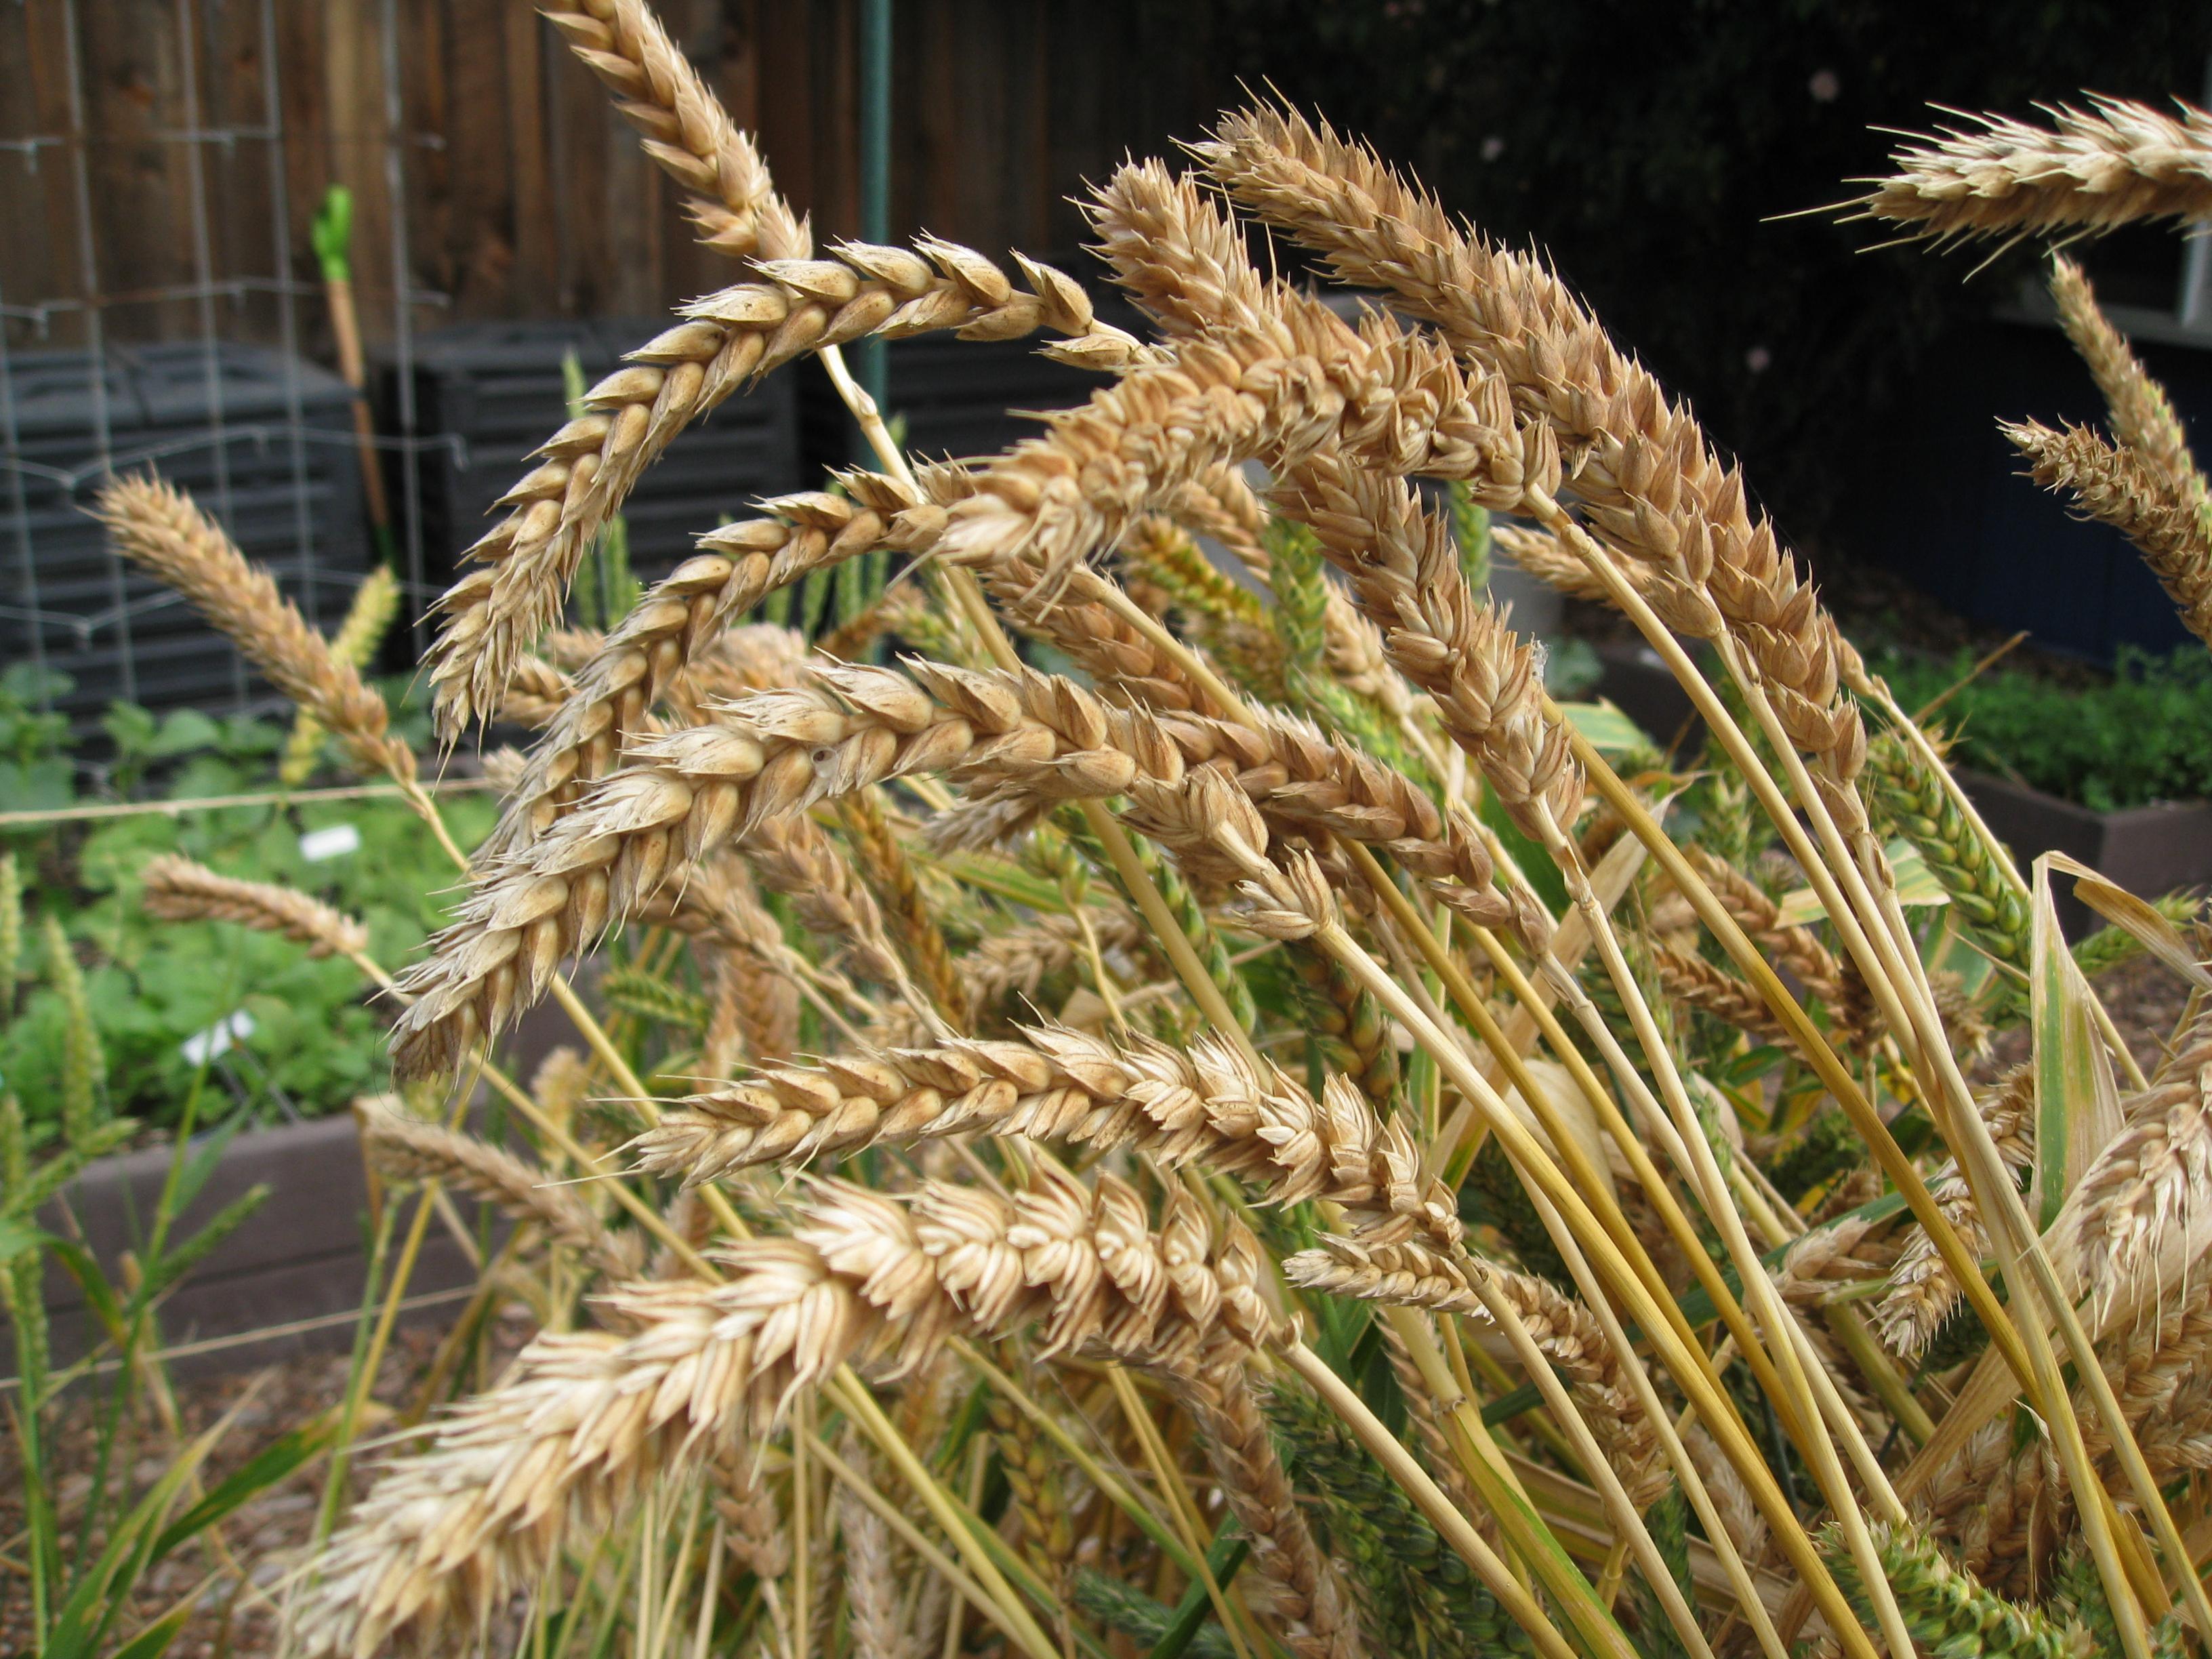 White Sonora Wheat nearing harvest